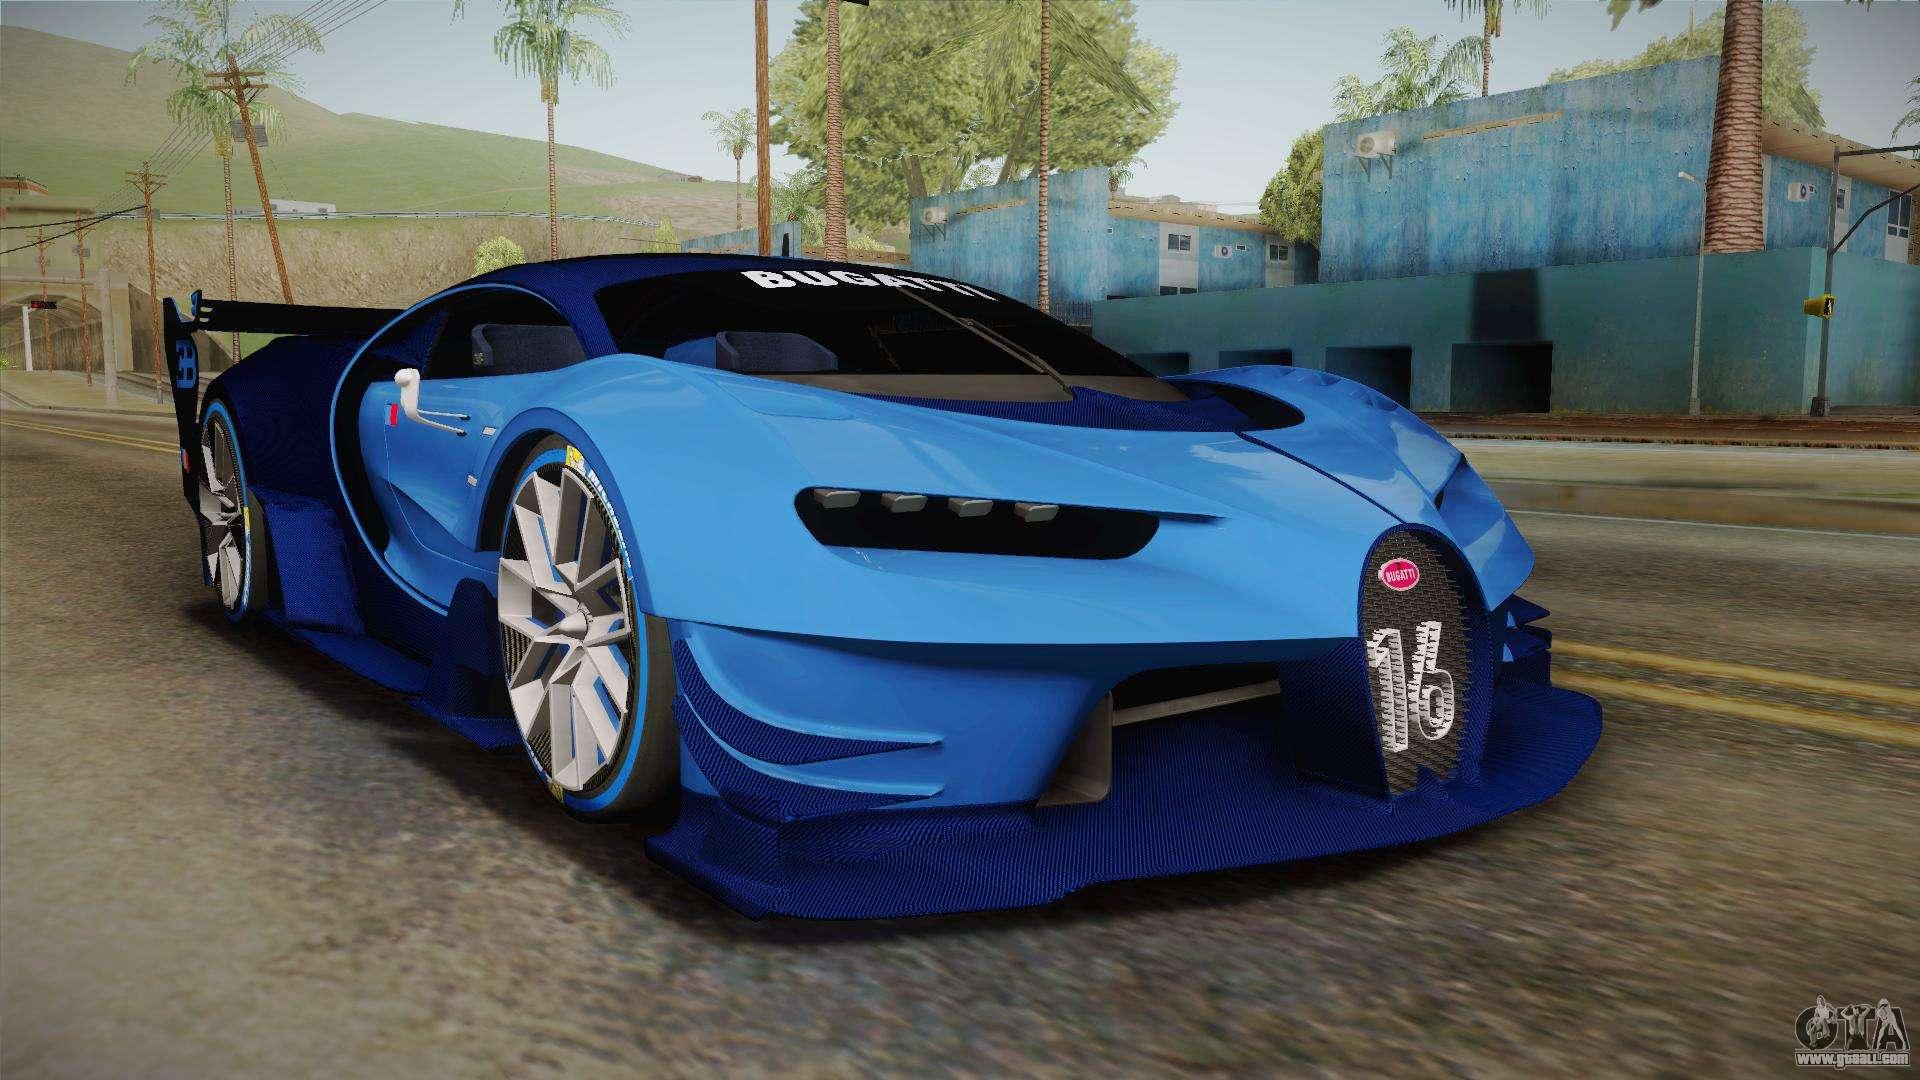 397967-gta-sa-2017-05-02-20-36-10-97 Terrific Bugatti Veyron Mod Gta Sa Cars Trend